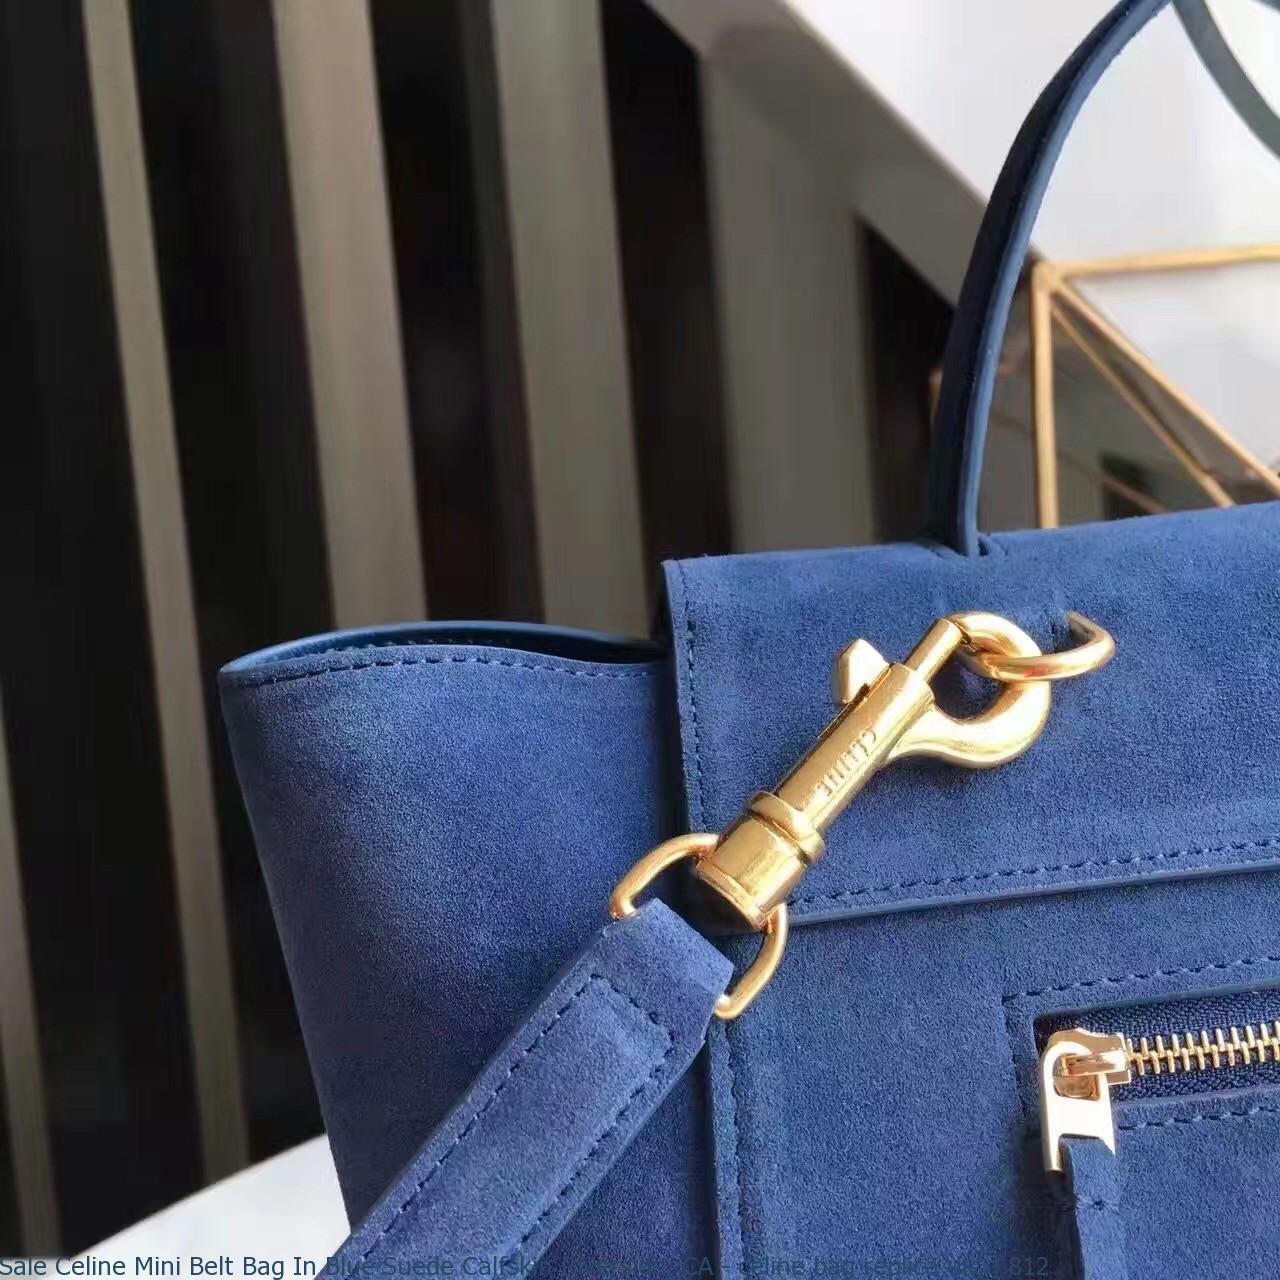 Sale Celine Mini Belt Bag In Blue Suede Calfskin Riverside 1dda82156083e